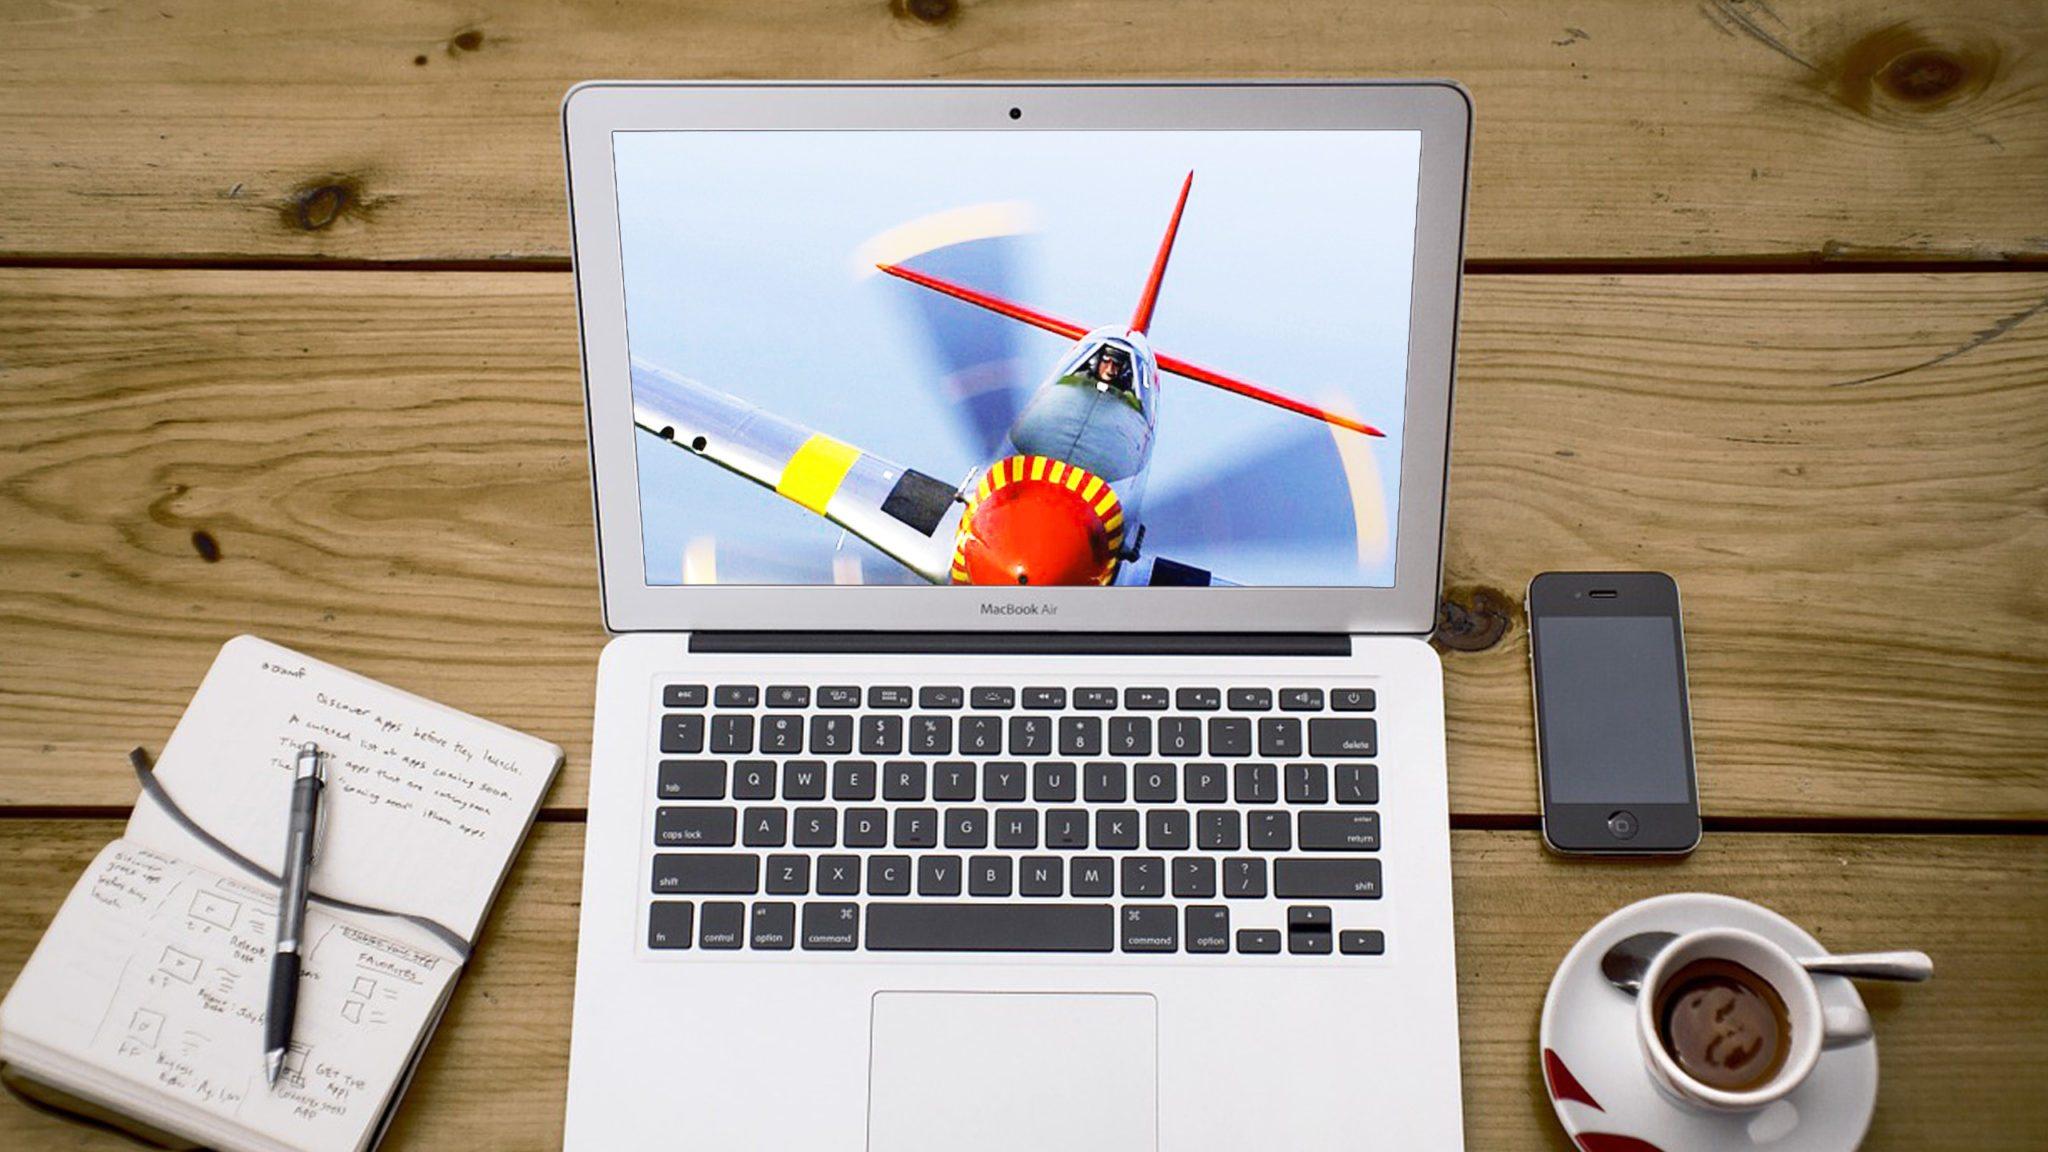 Elementary OS - Desktop